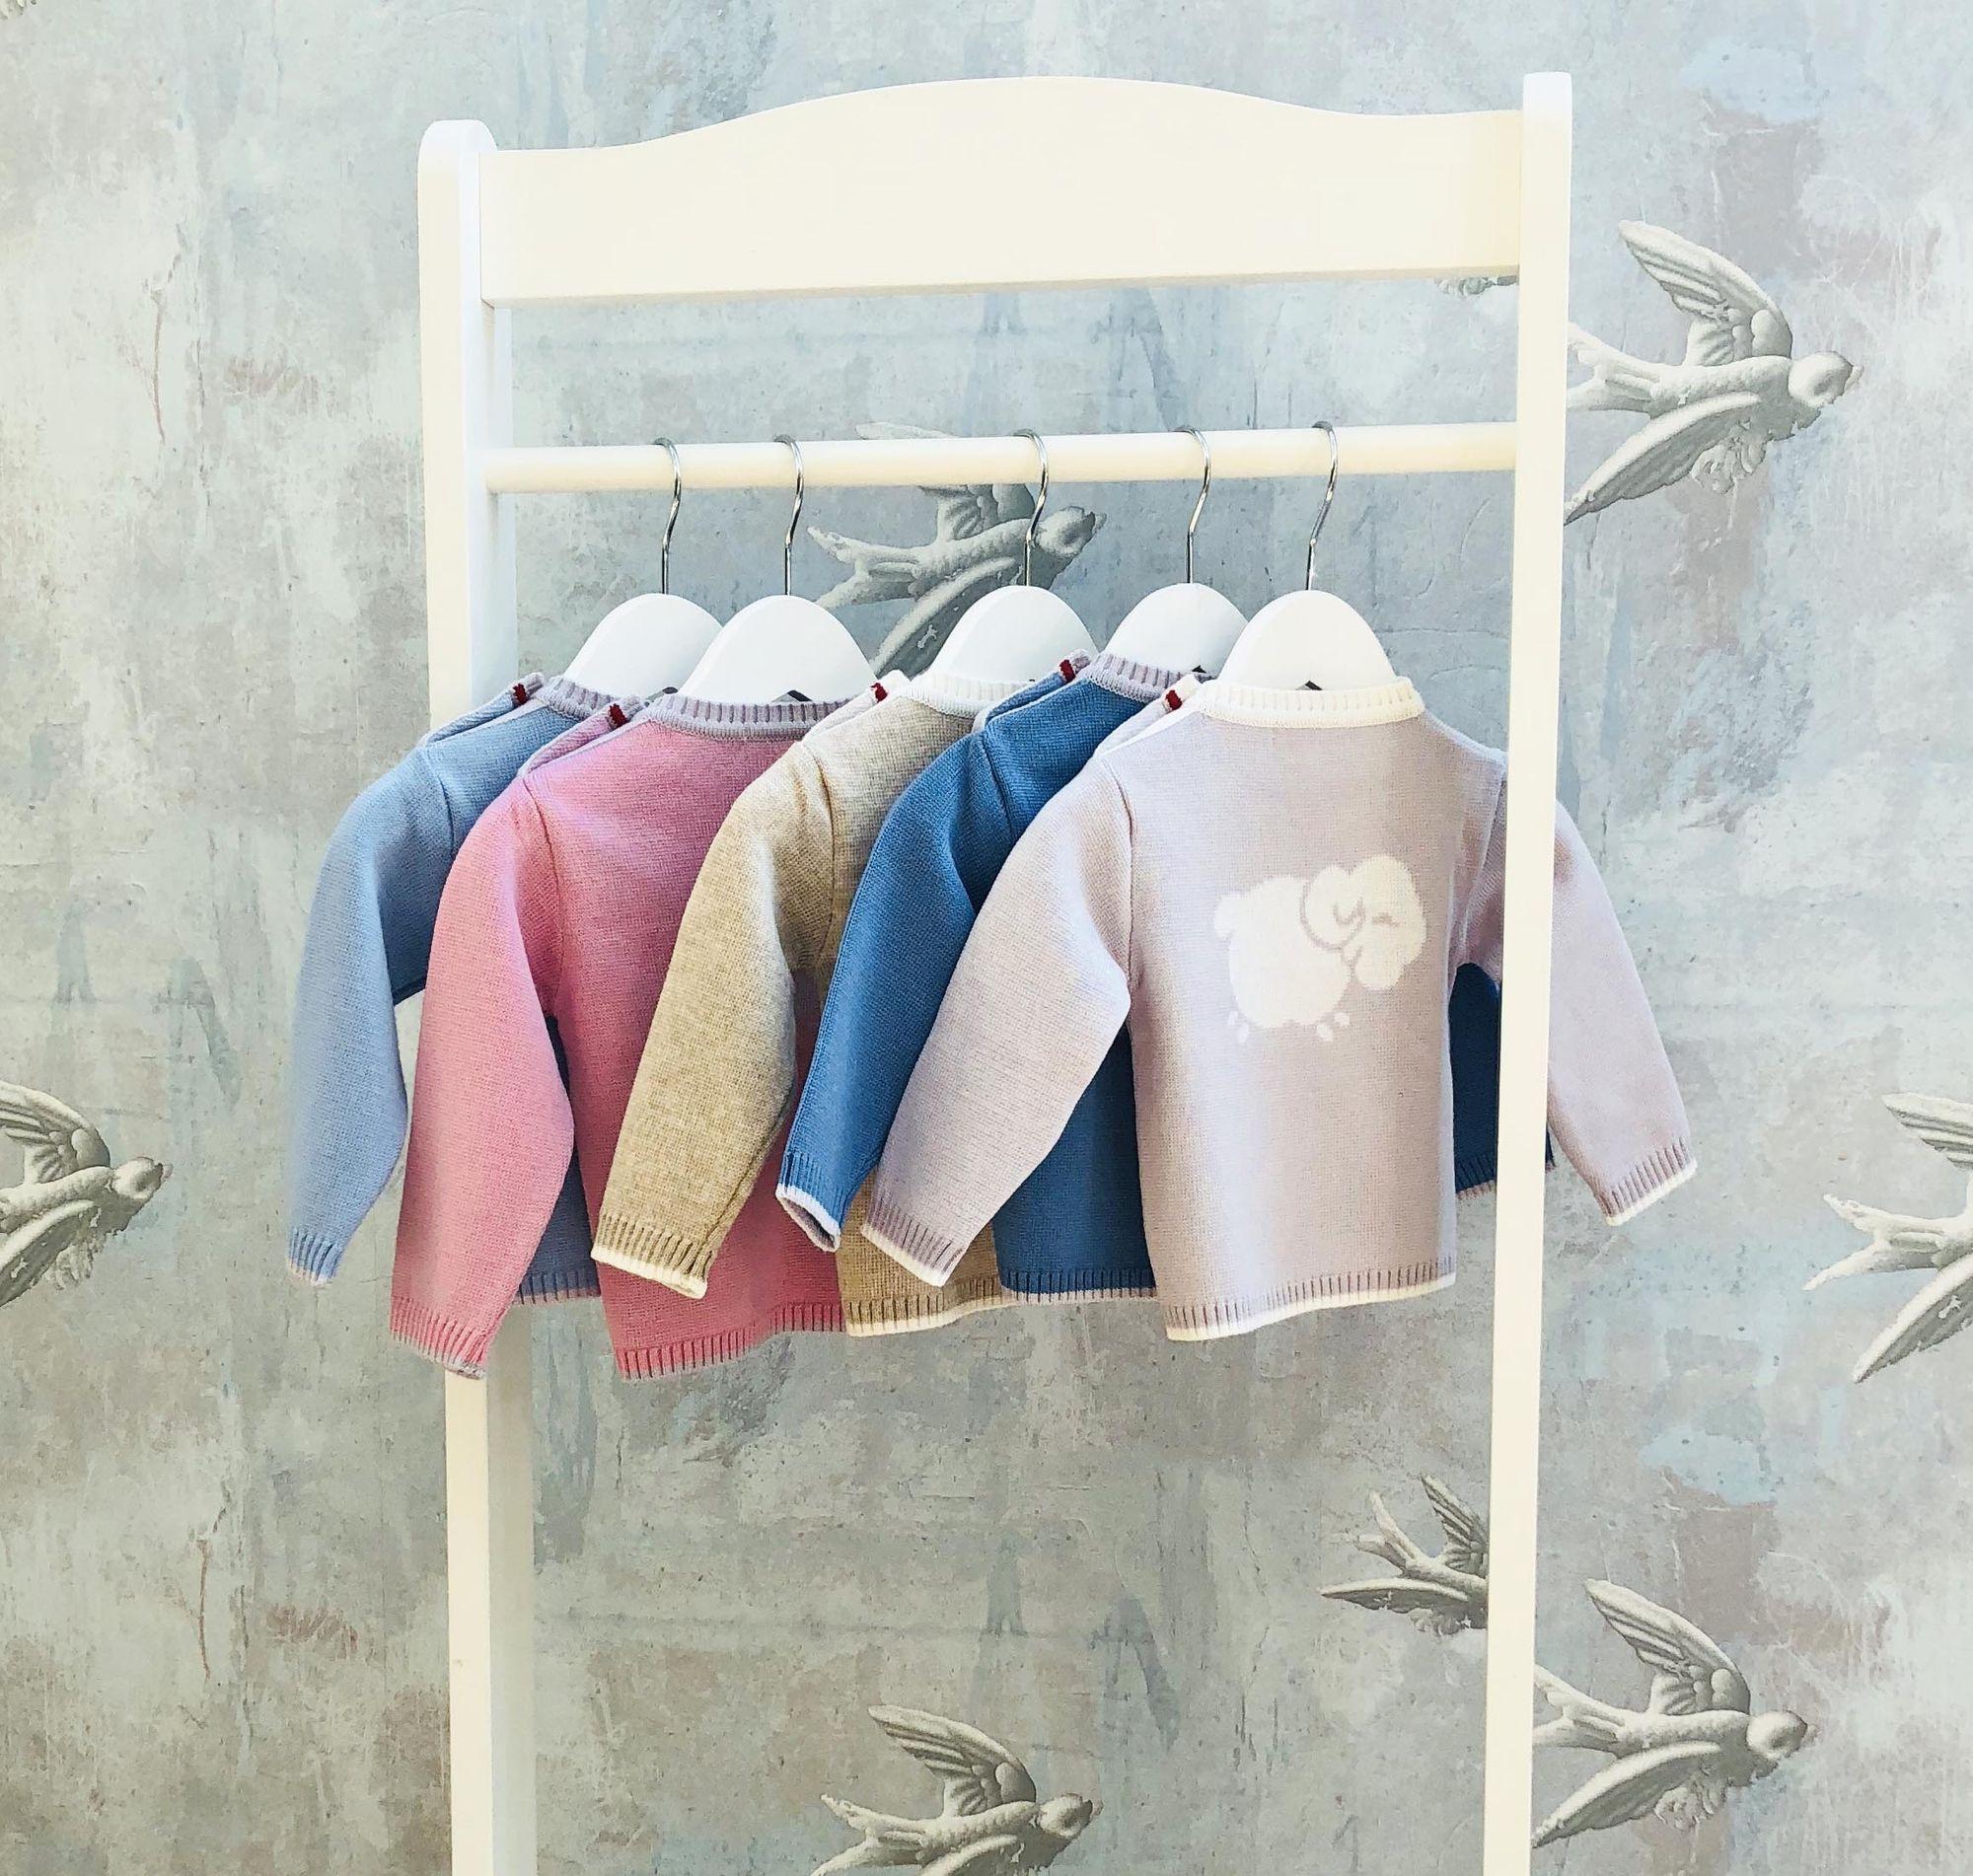 Our signature sheep motif jumper is available in 5 colours ❤️ What colour is your favourite? Shop here    #sustainablefashion #livenaturally #scarletribbon #sustainability #igmotherhood #letskeepitsimple #sustainableliving #Livethelittlethings #wool #merinowool #mumblogger #igmotherhood #mamahood #momentslikethese #happynow #mumpreneur #momsofig #momlife #igbaby #letthembelittle #toddler #toddlerlife  #mum_hub #worldoflittles